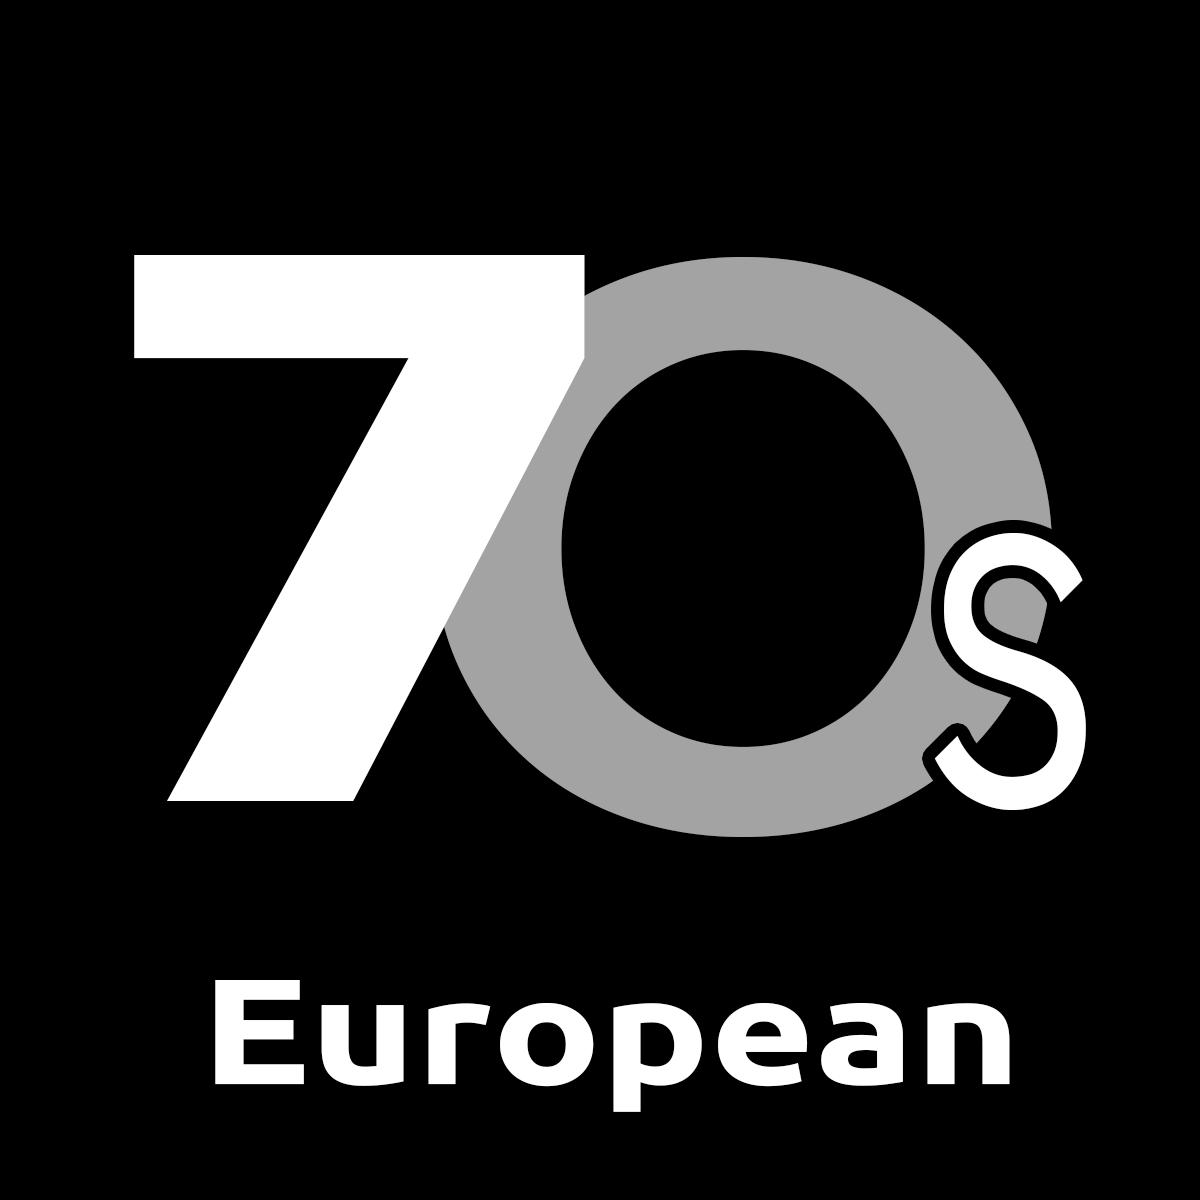 70s Euro Music (GLWiZ)